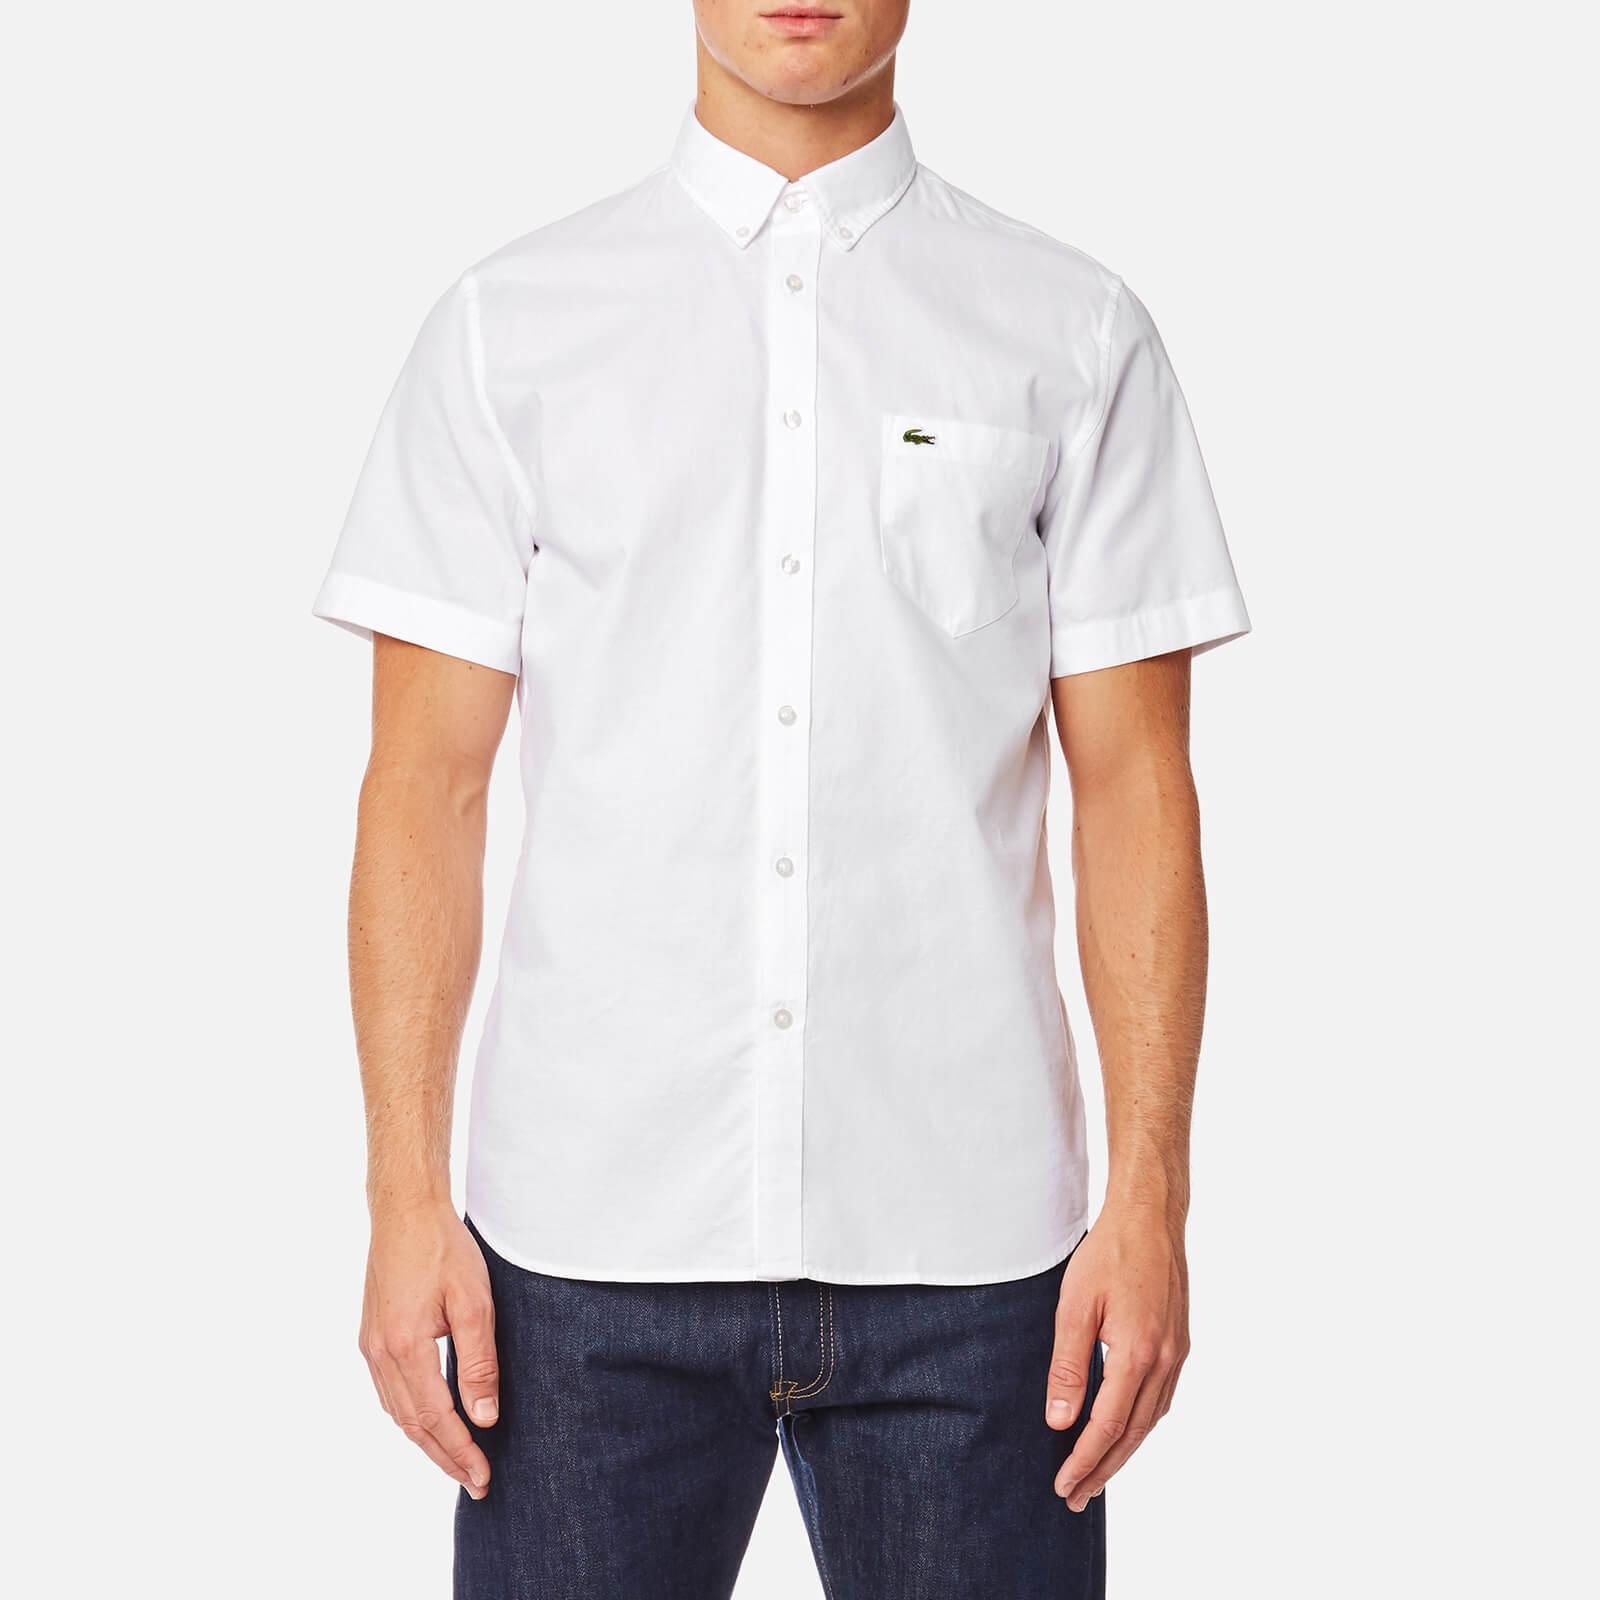 b6b078489 Lacoste Men s Short Sleeve Shirt - White White - Free UK Delivery over £50